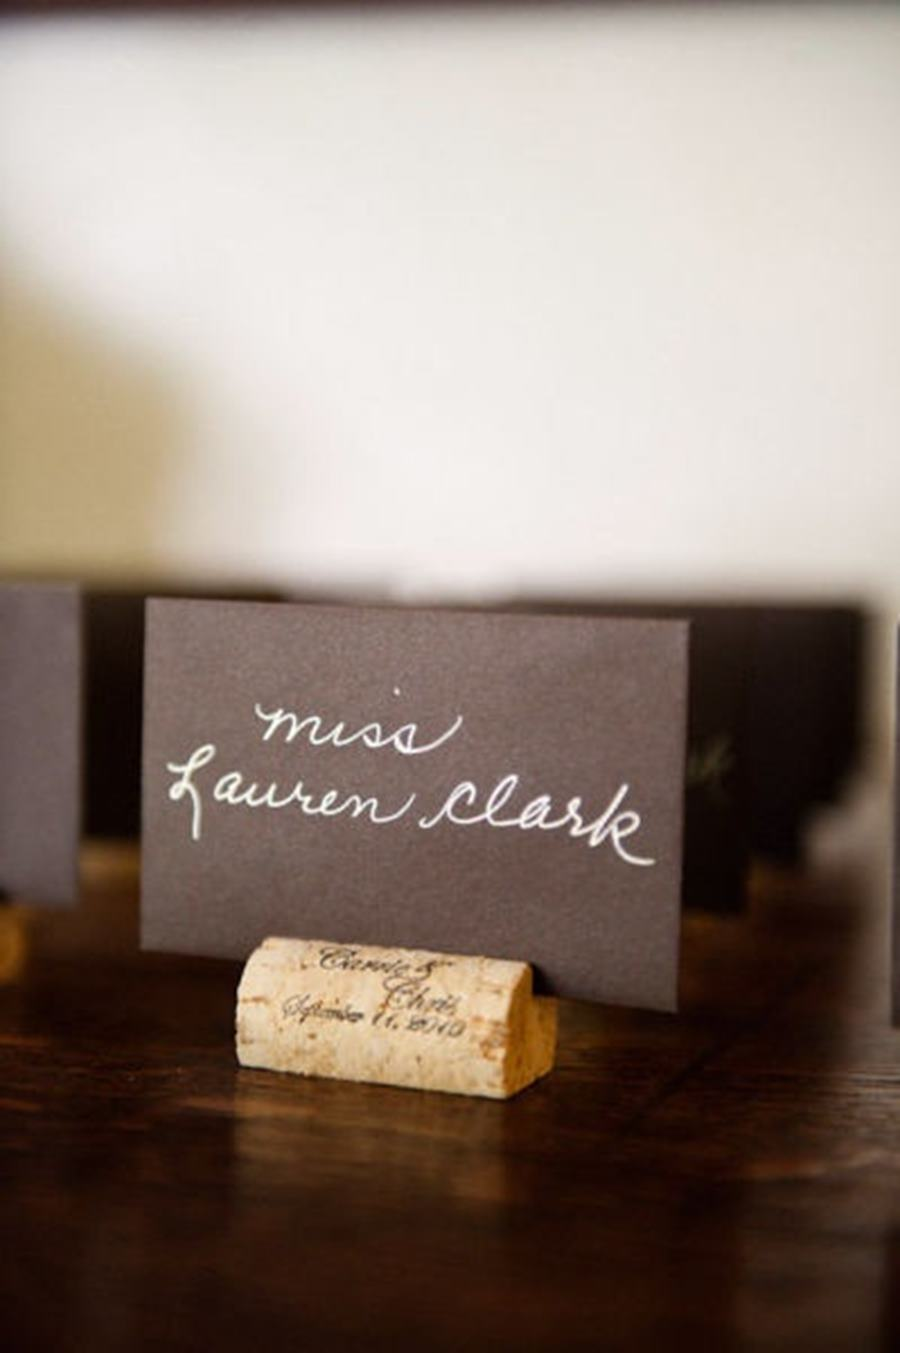 Personalised cork name card holders